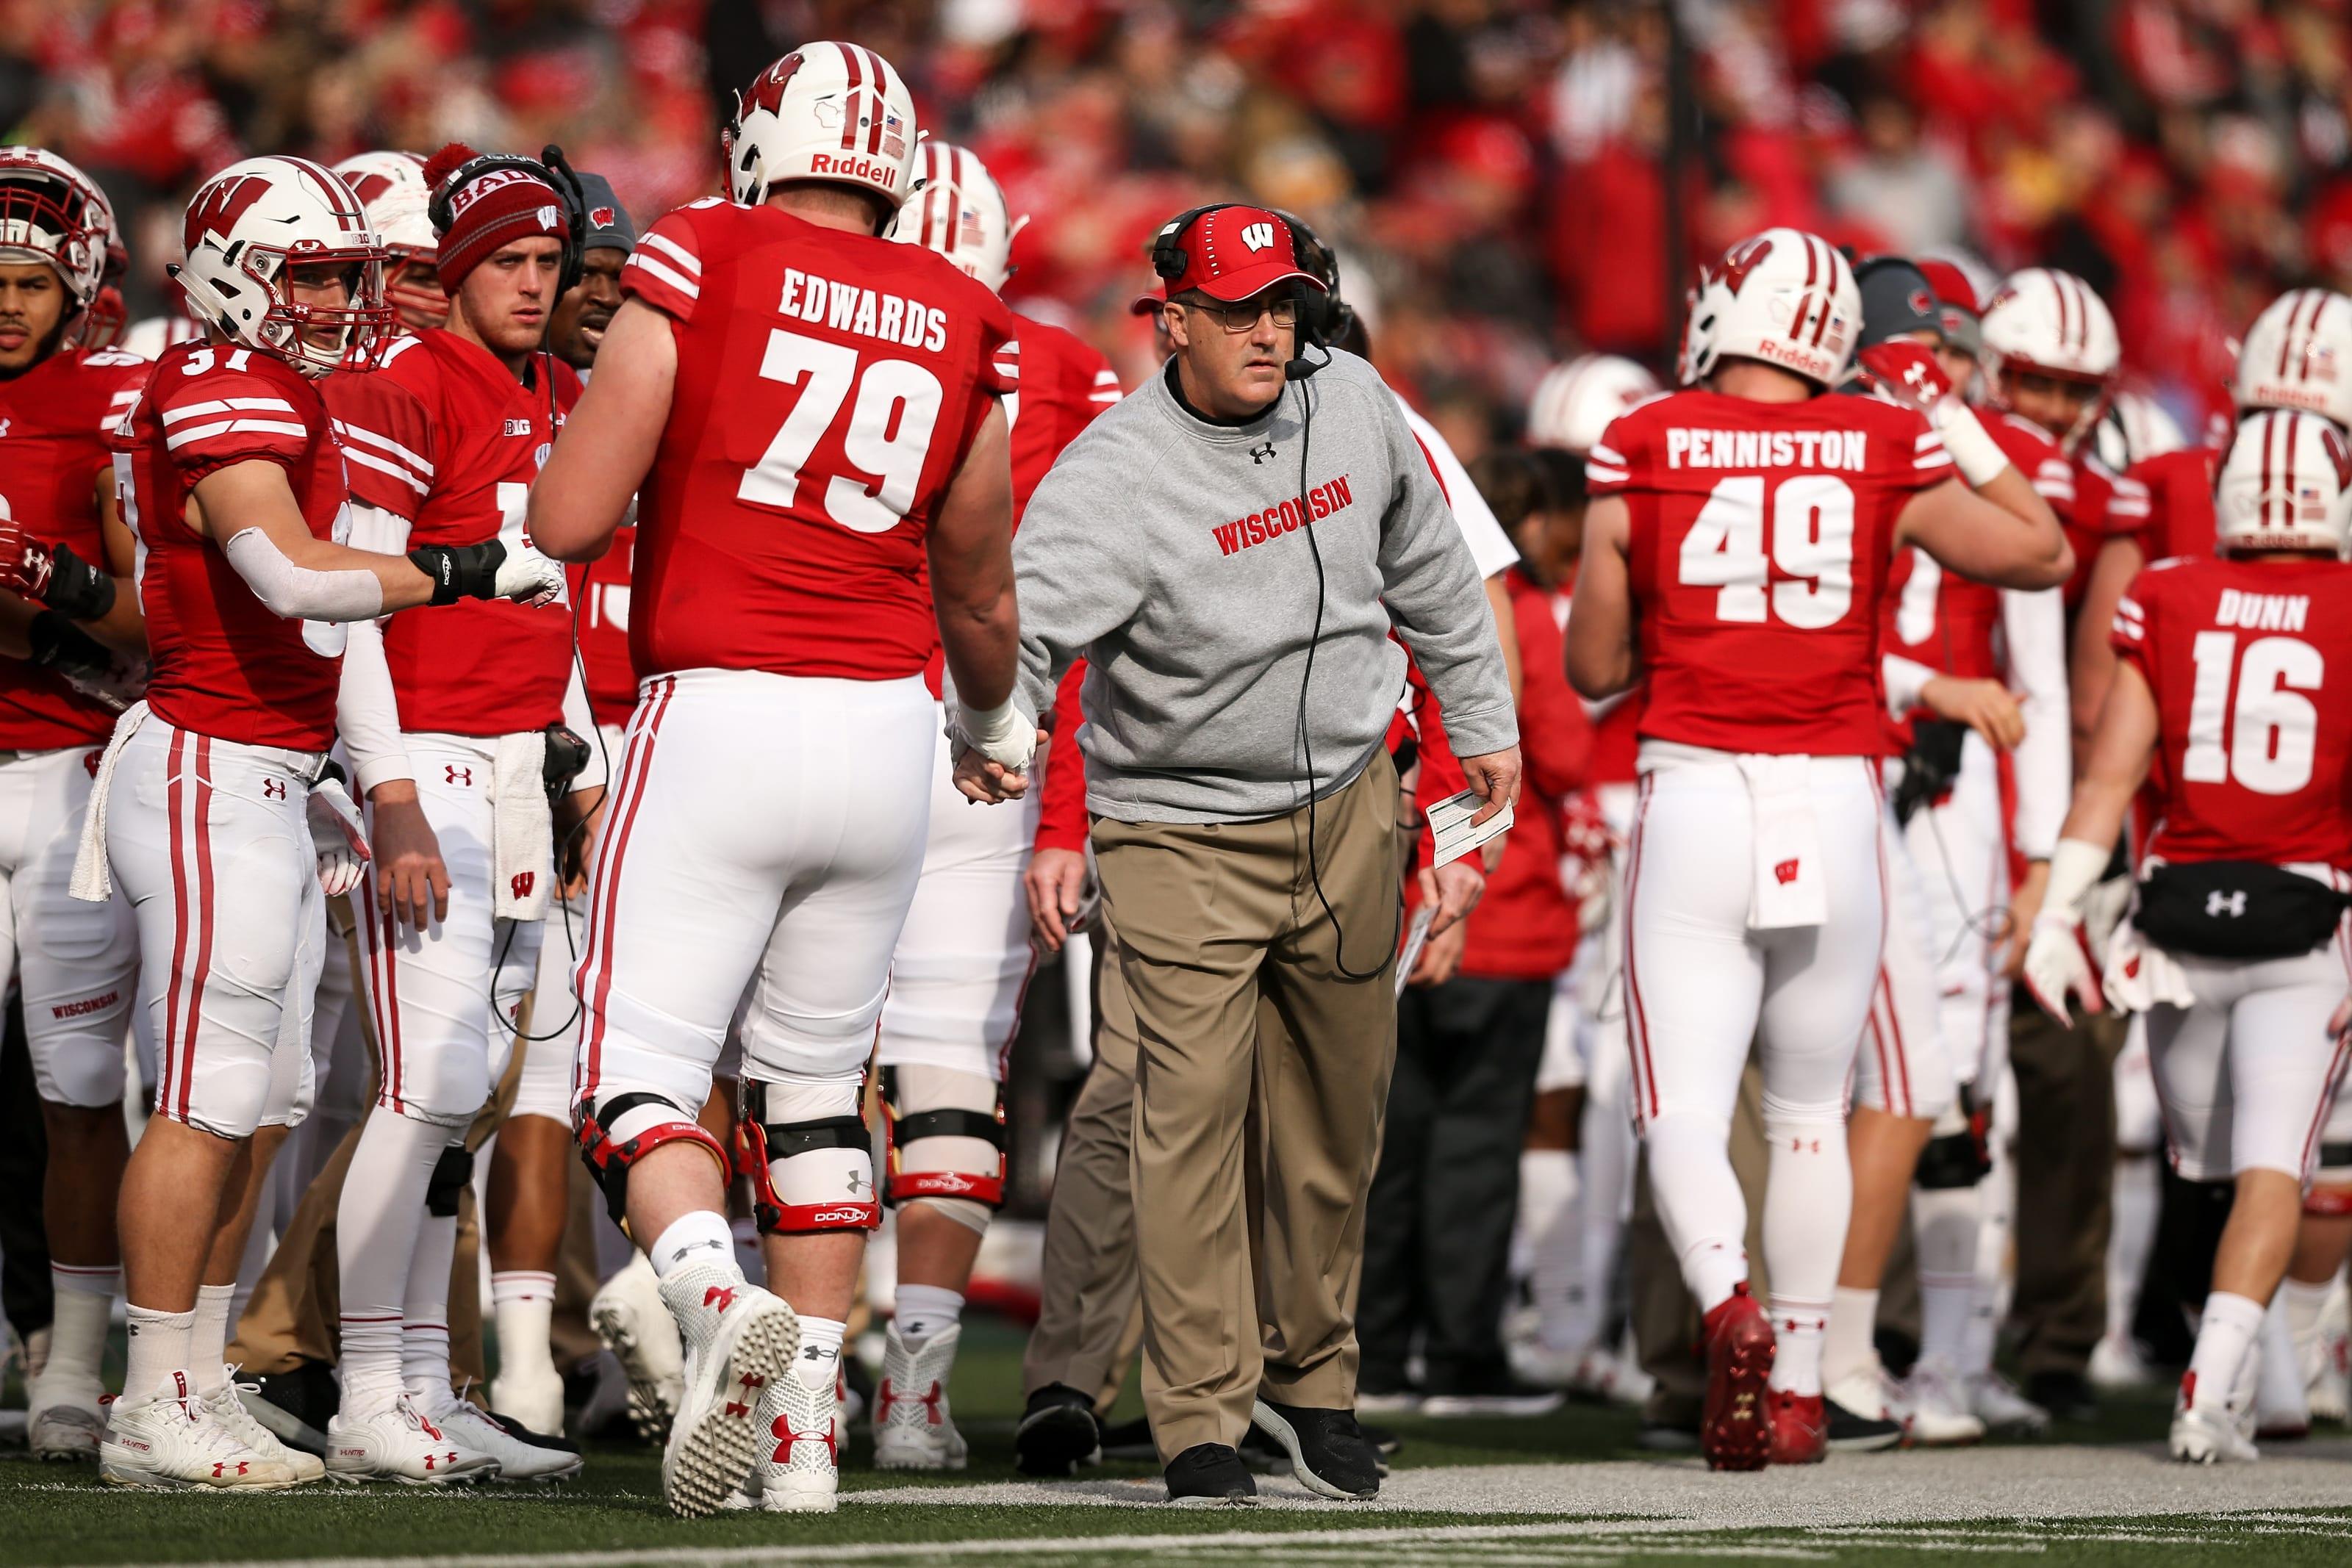 Wisconsin football - David Edwards